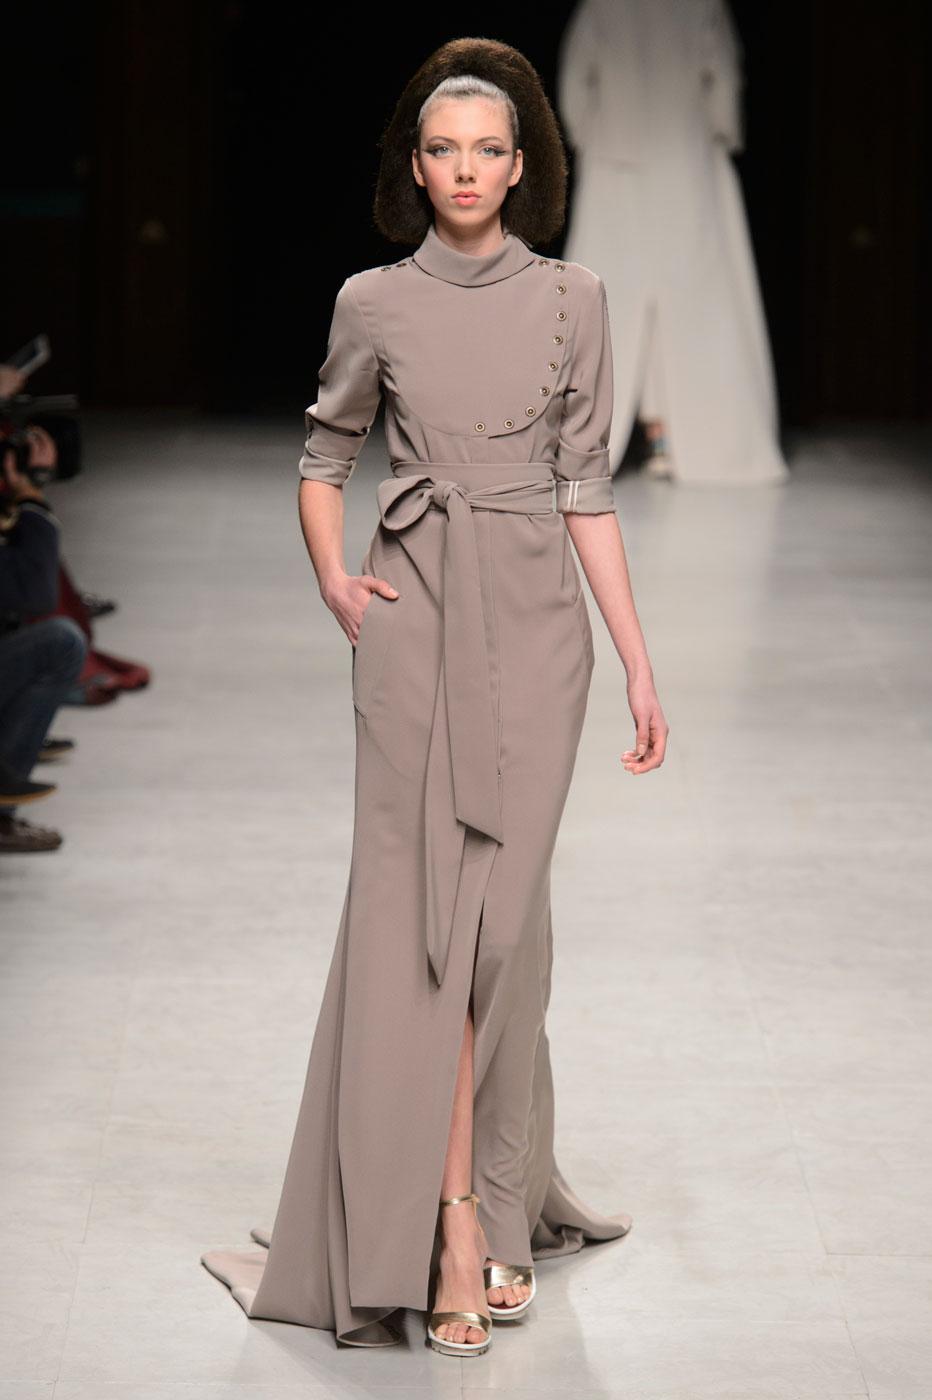 Julien-Fournie-Prive-fashion-runway-show-haute-couture-paris-spring-2015-the-impression-22